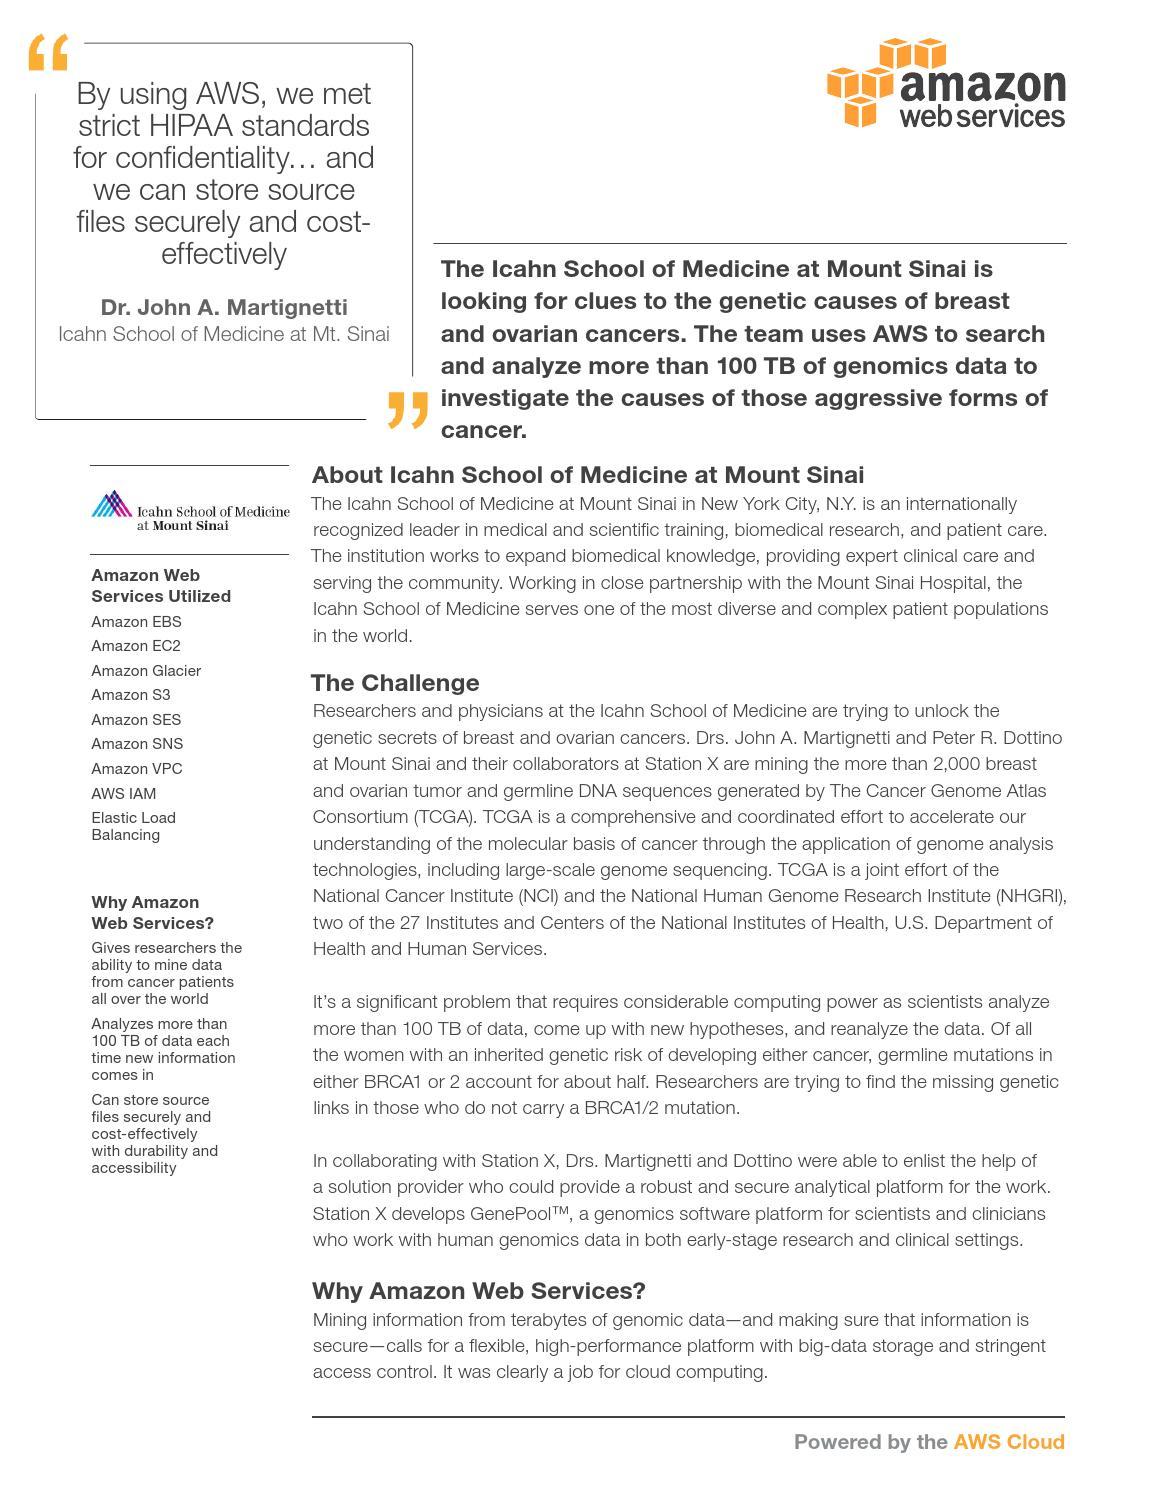 AWS Case Study: Mount Sinai Icahn School of Medicine